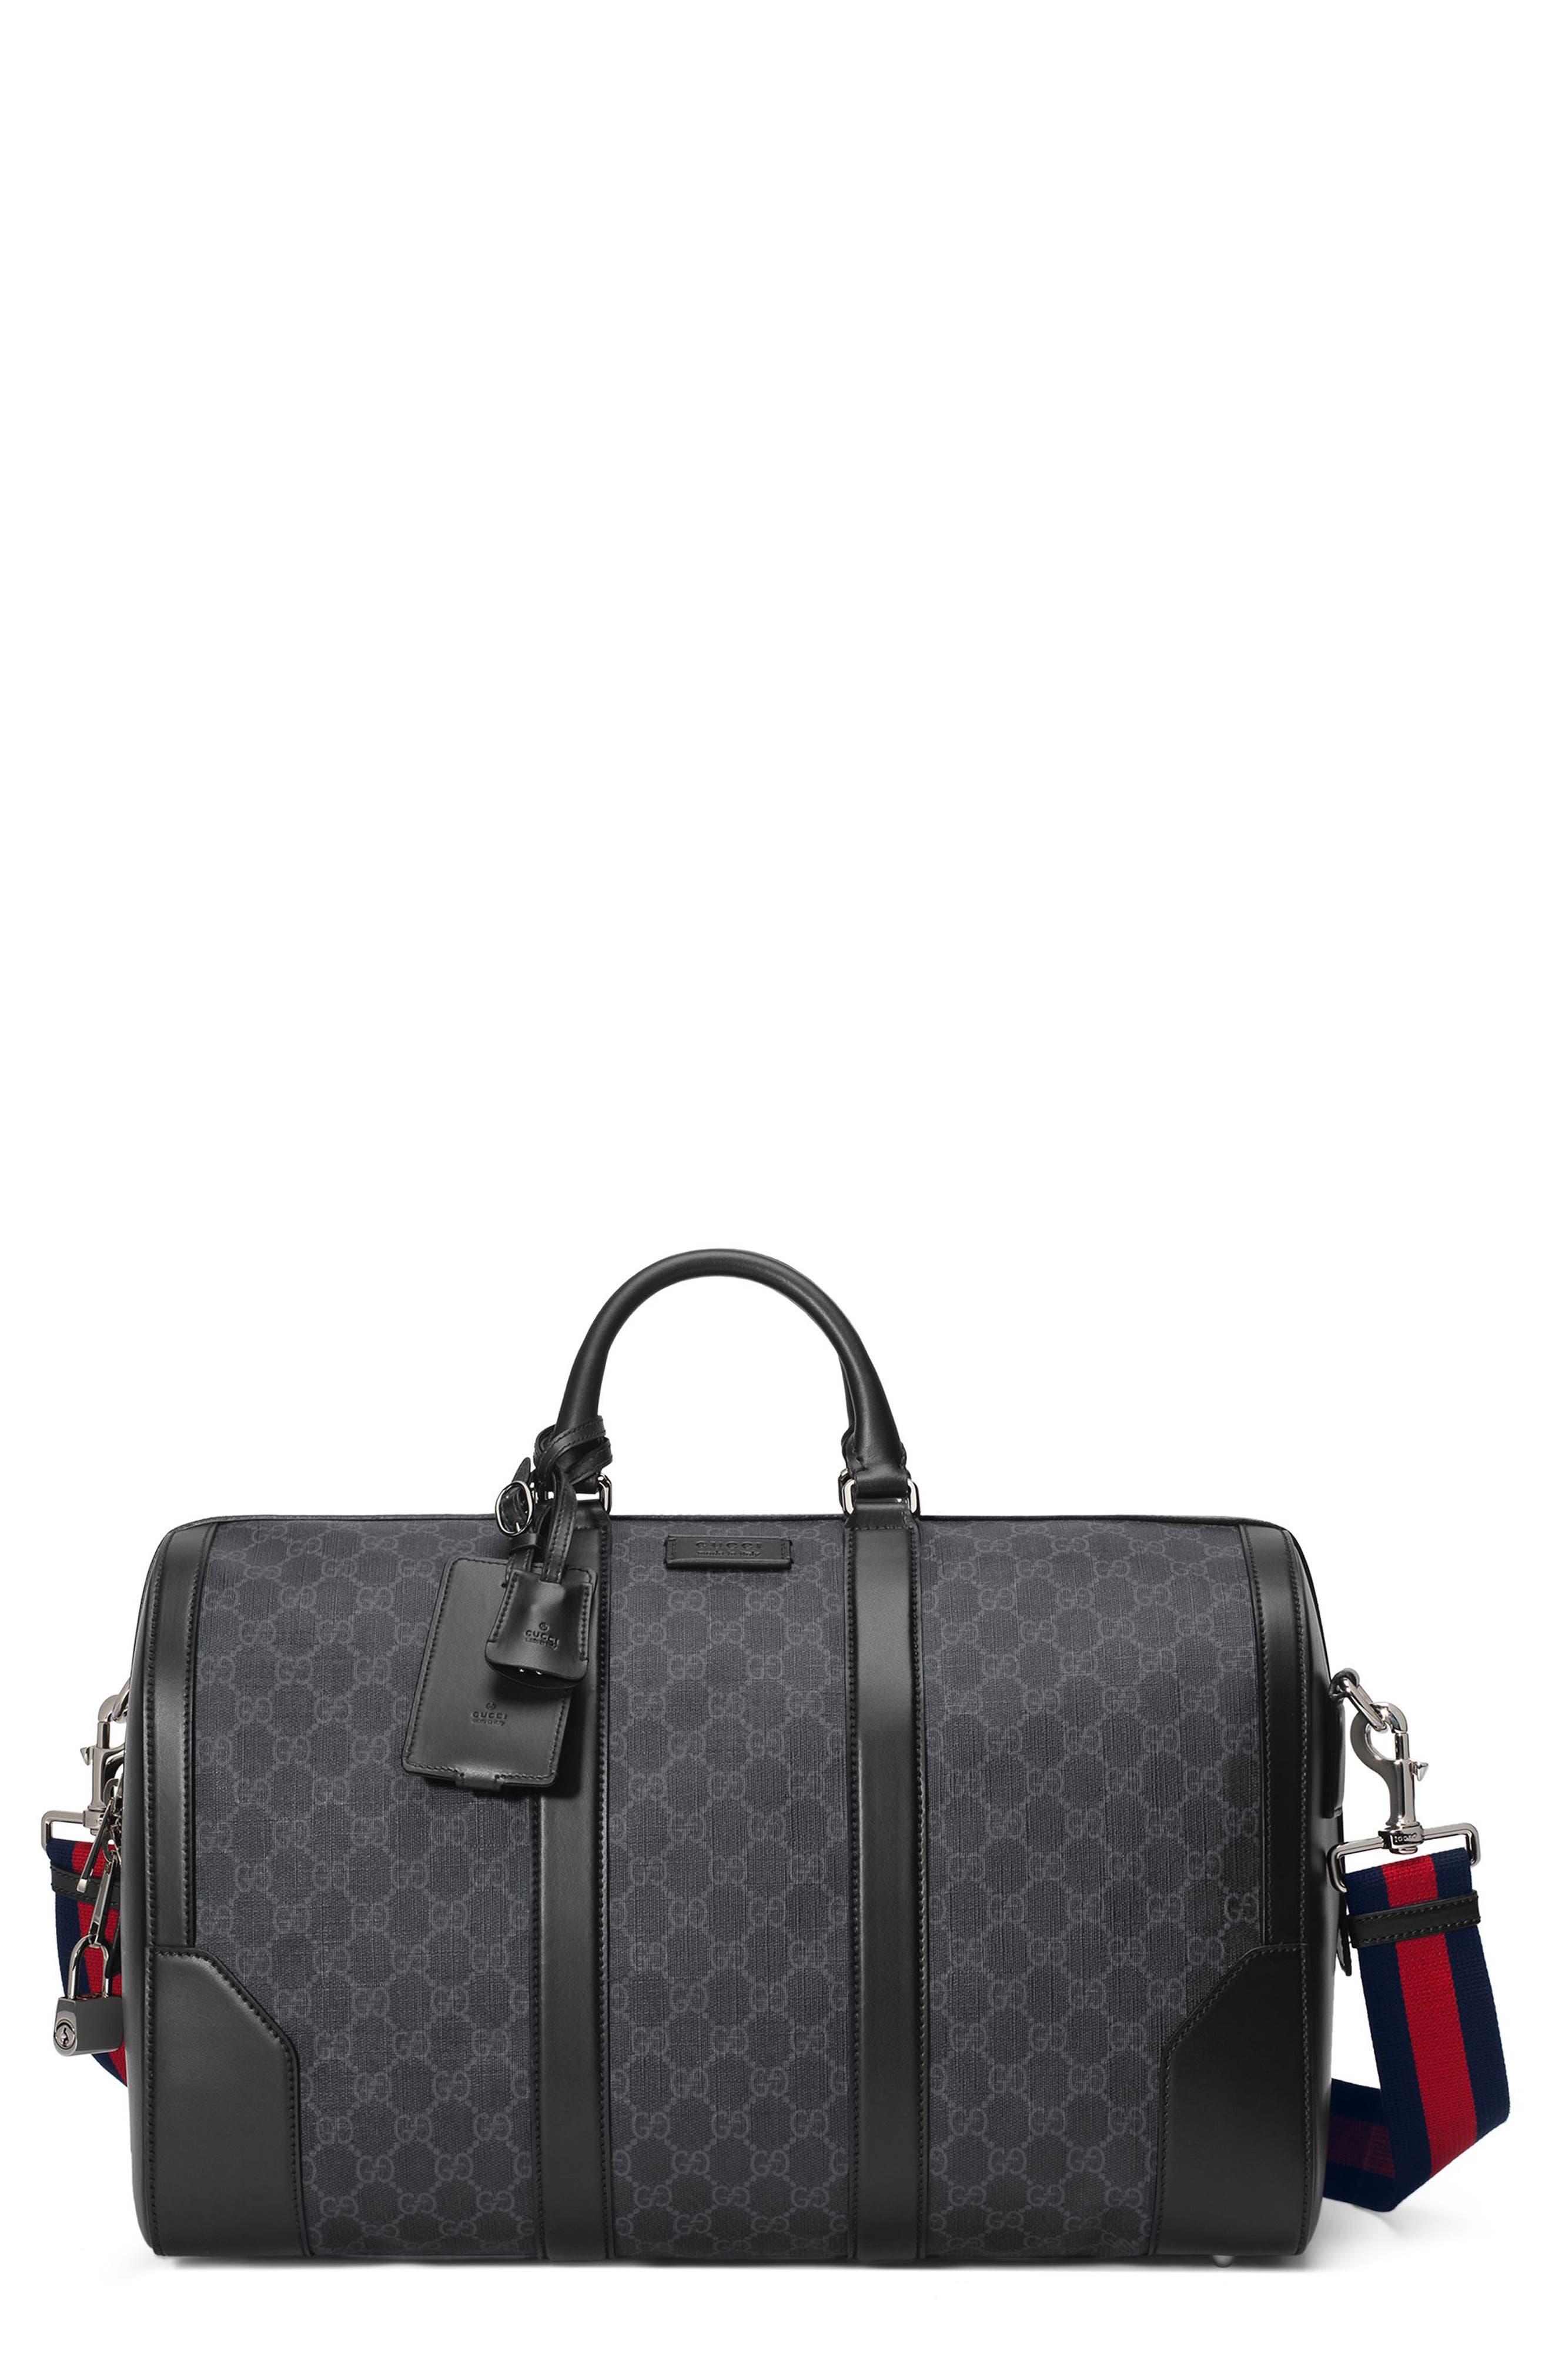 GG Supreme Duffel Bag,                             Main thumbnail 1, color,                             Black